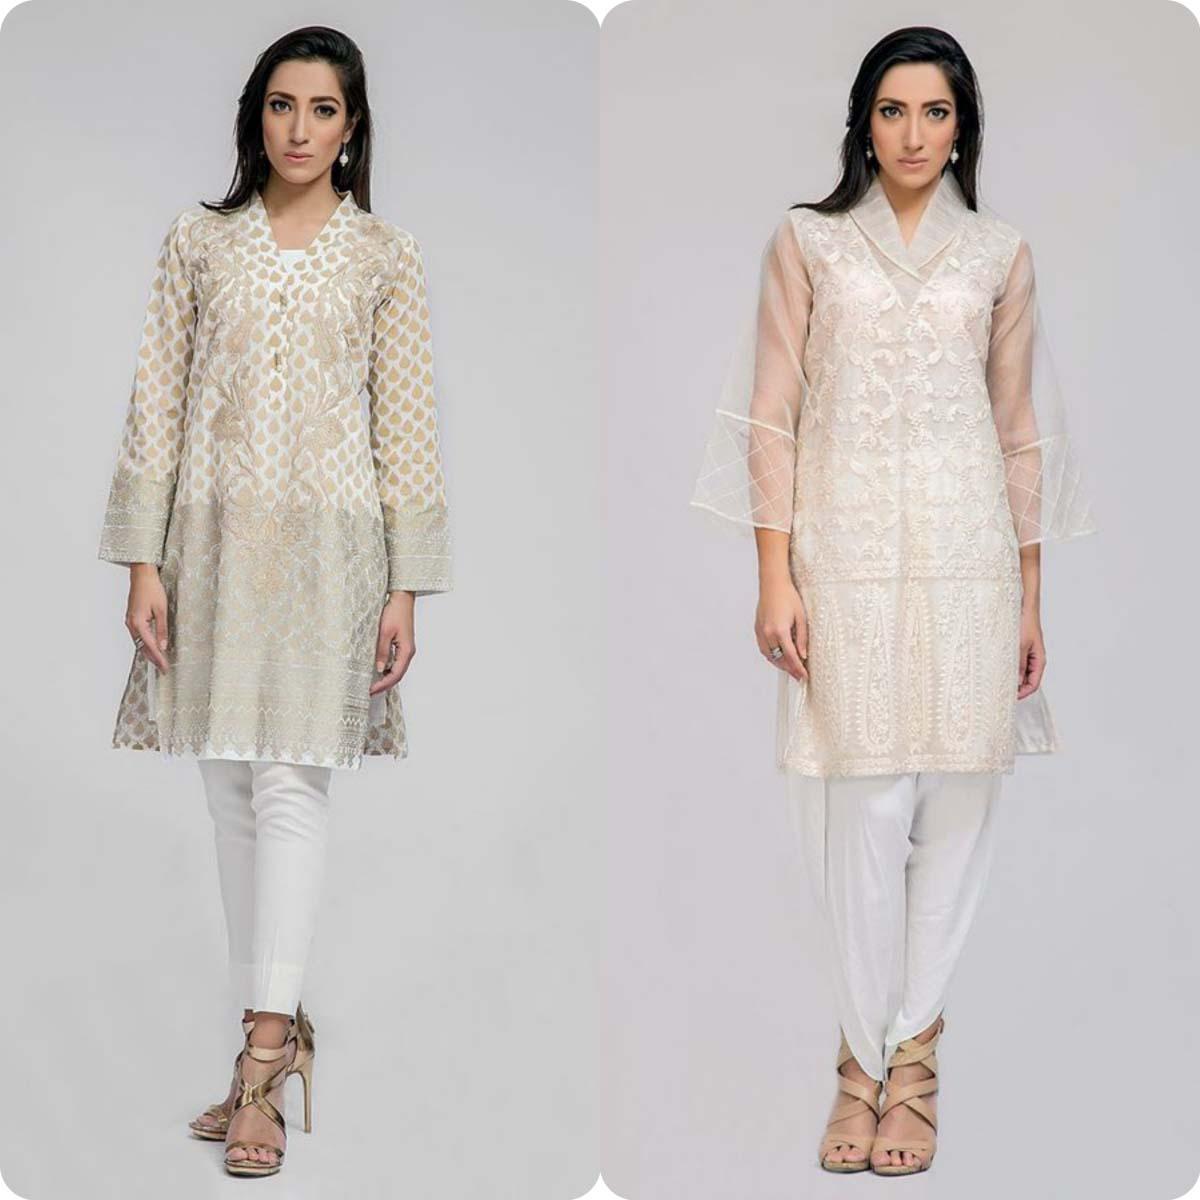 Deepak perwani Luxury Pret Eid Collection for Men and Women 2016-2017 (19)